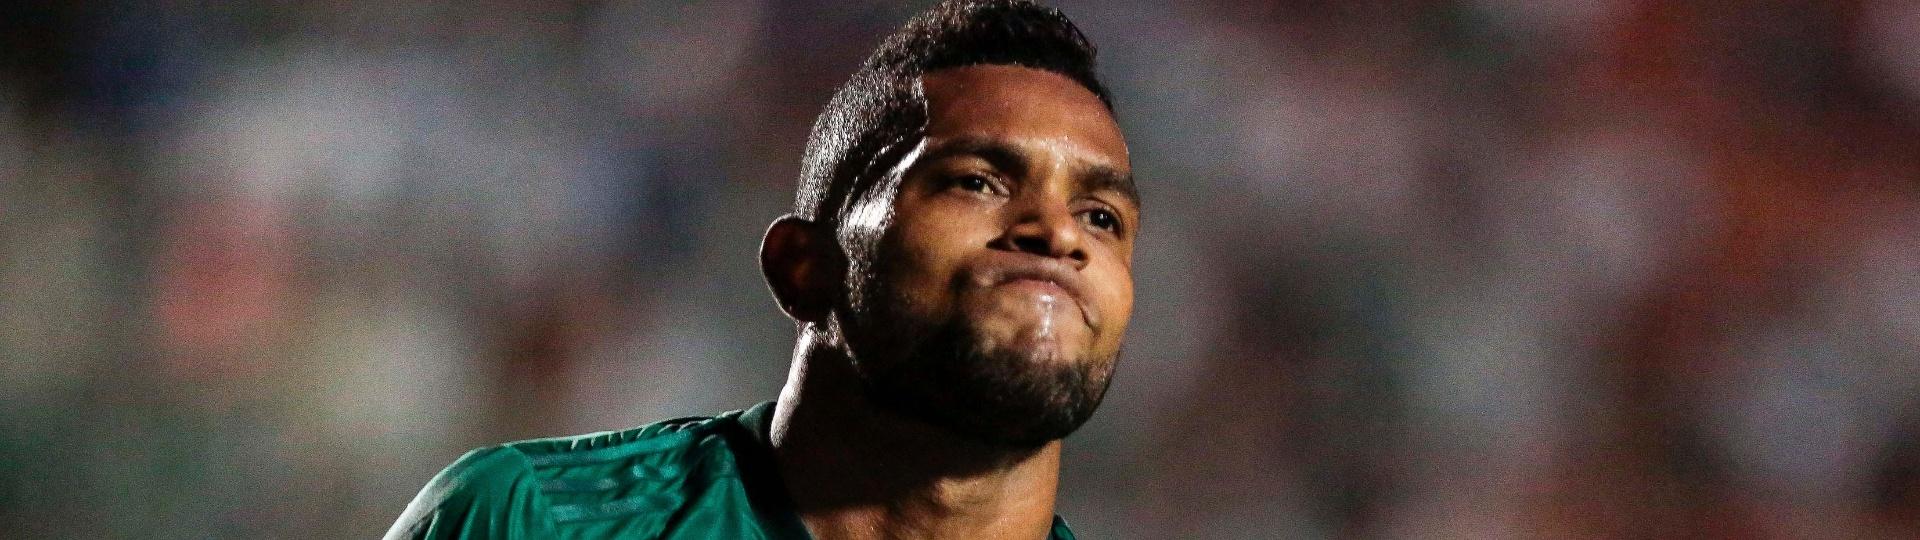 Borja comemora gol marcado para o Palmeiras contra a Ponte Preta